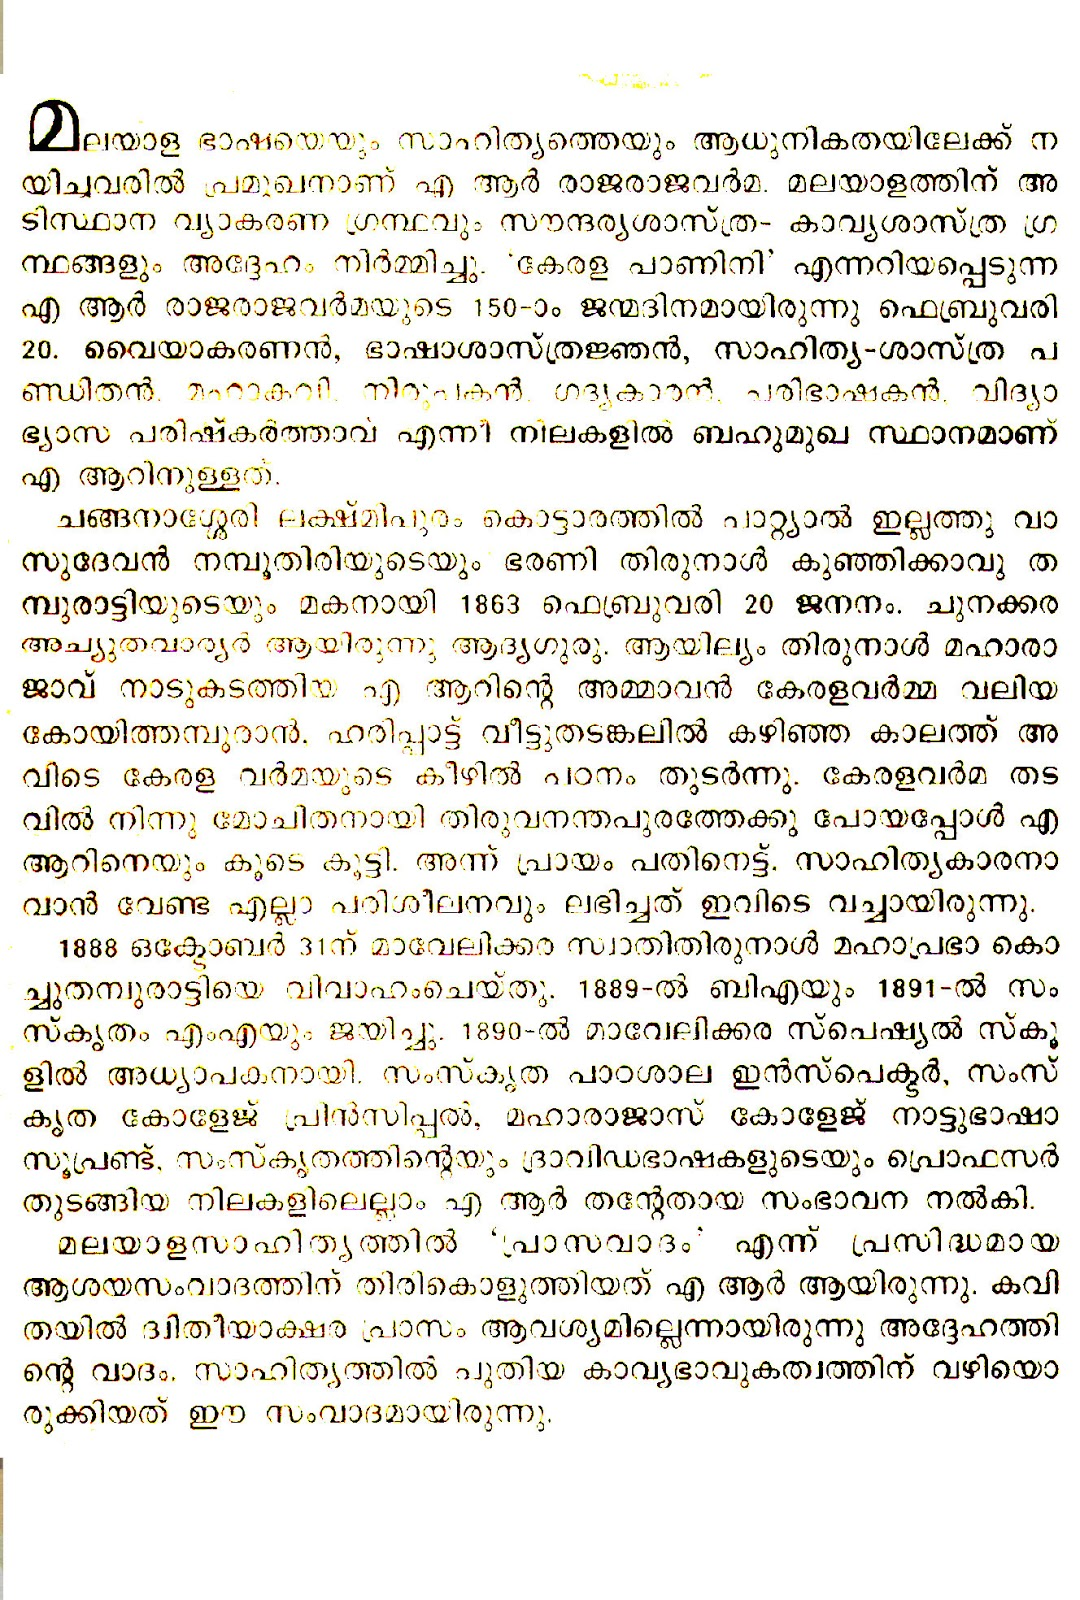 A. R. Raja Raja Varma